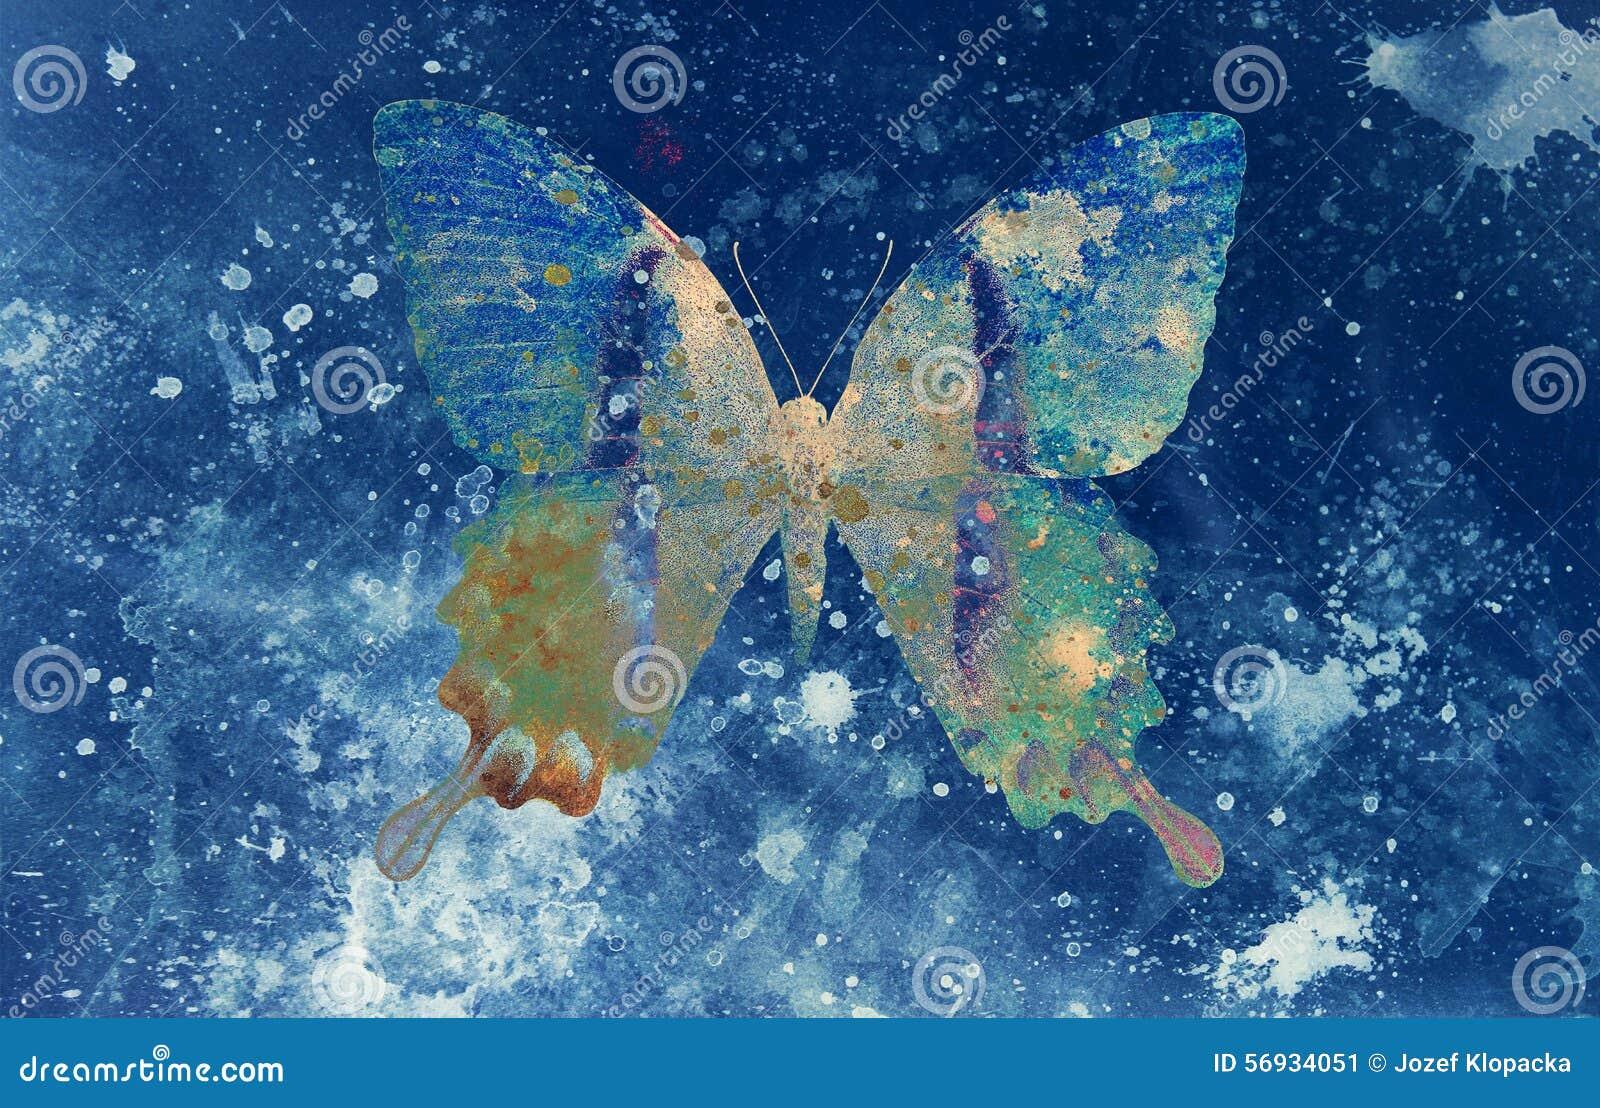 Ejemplo de una mariposa del color, medio mezclado, backgrou azul